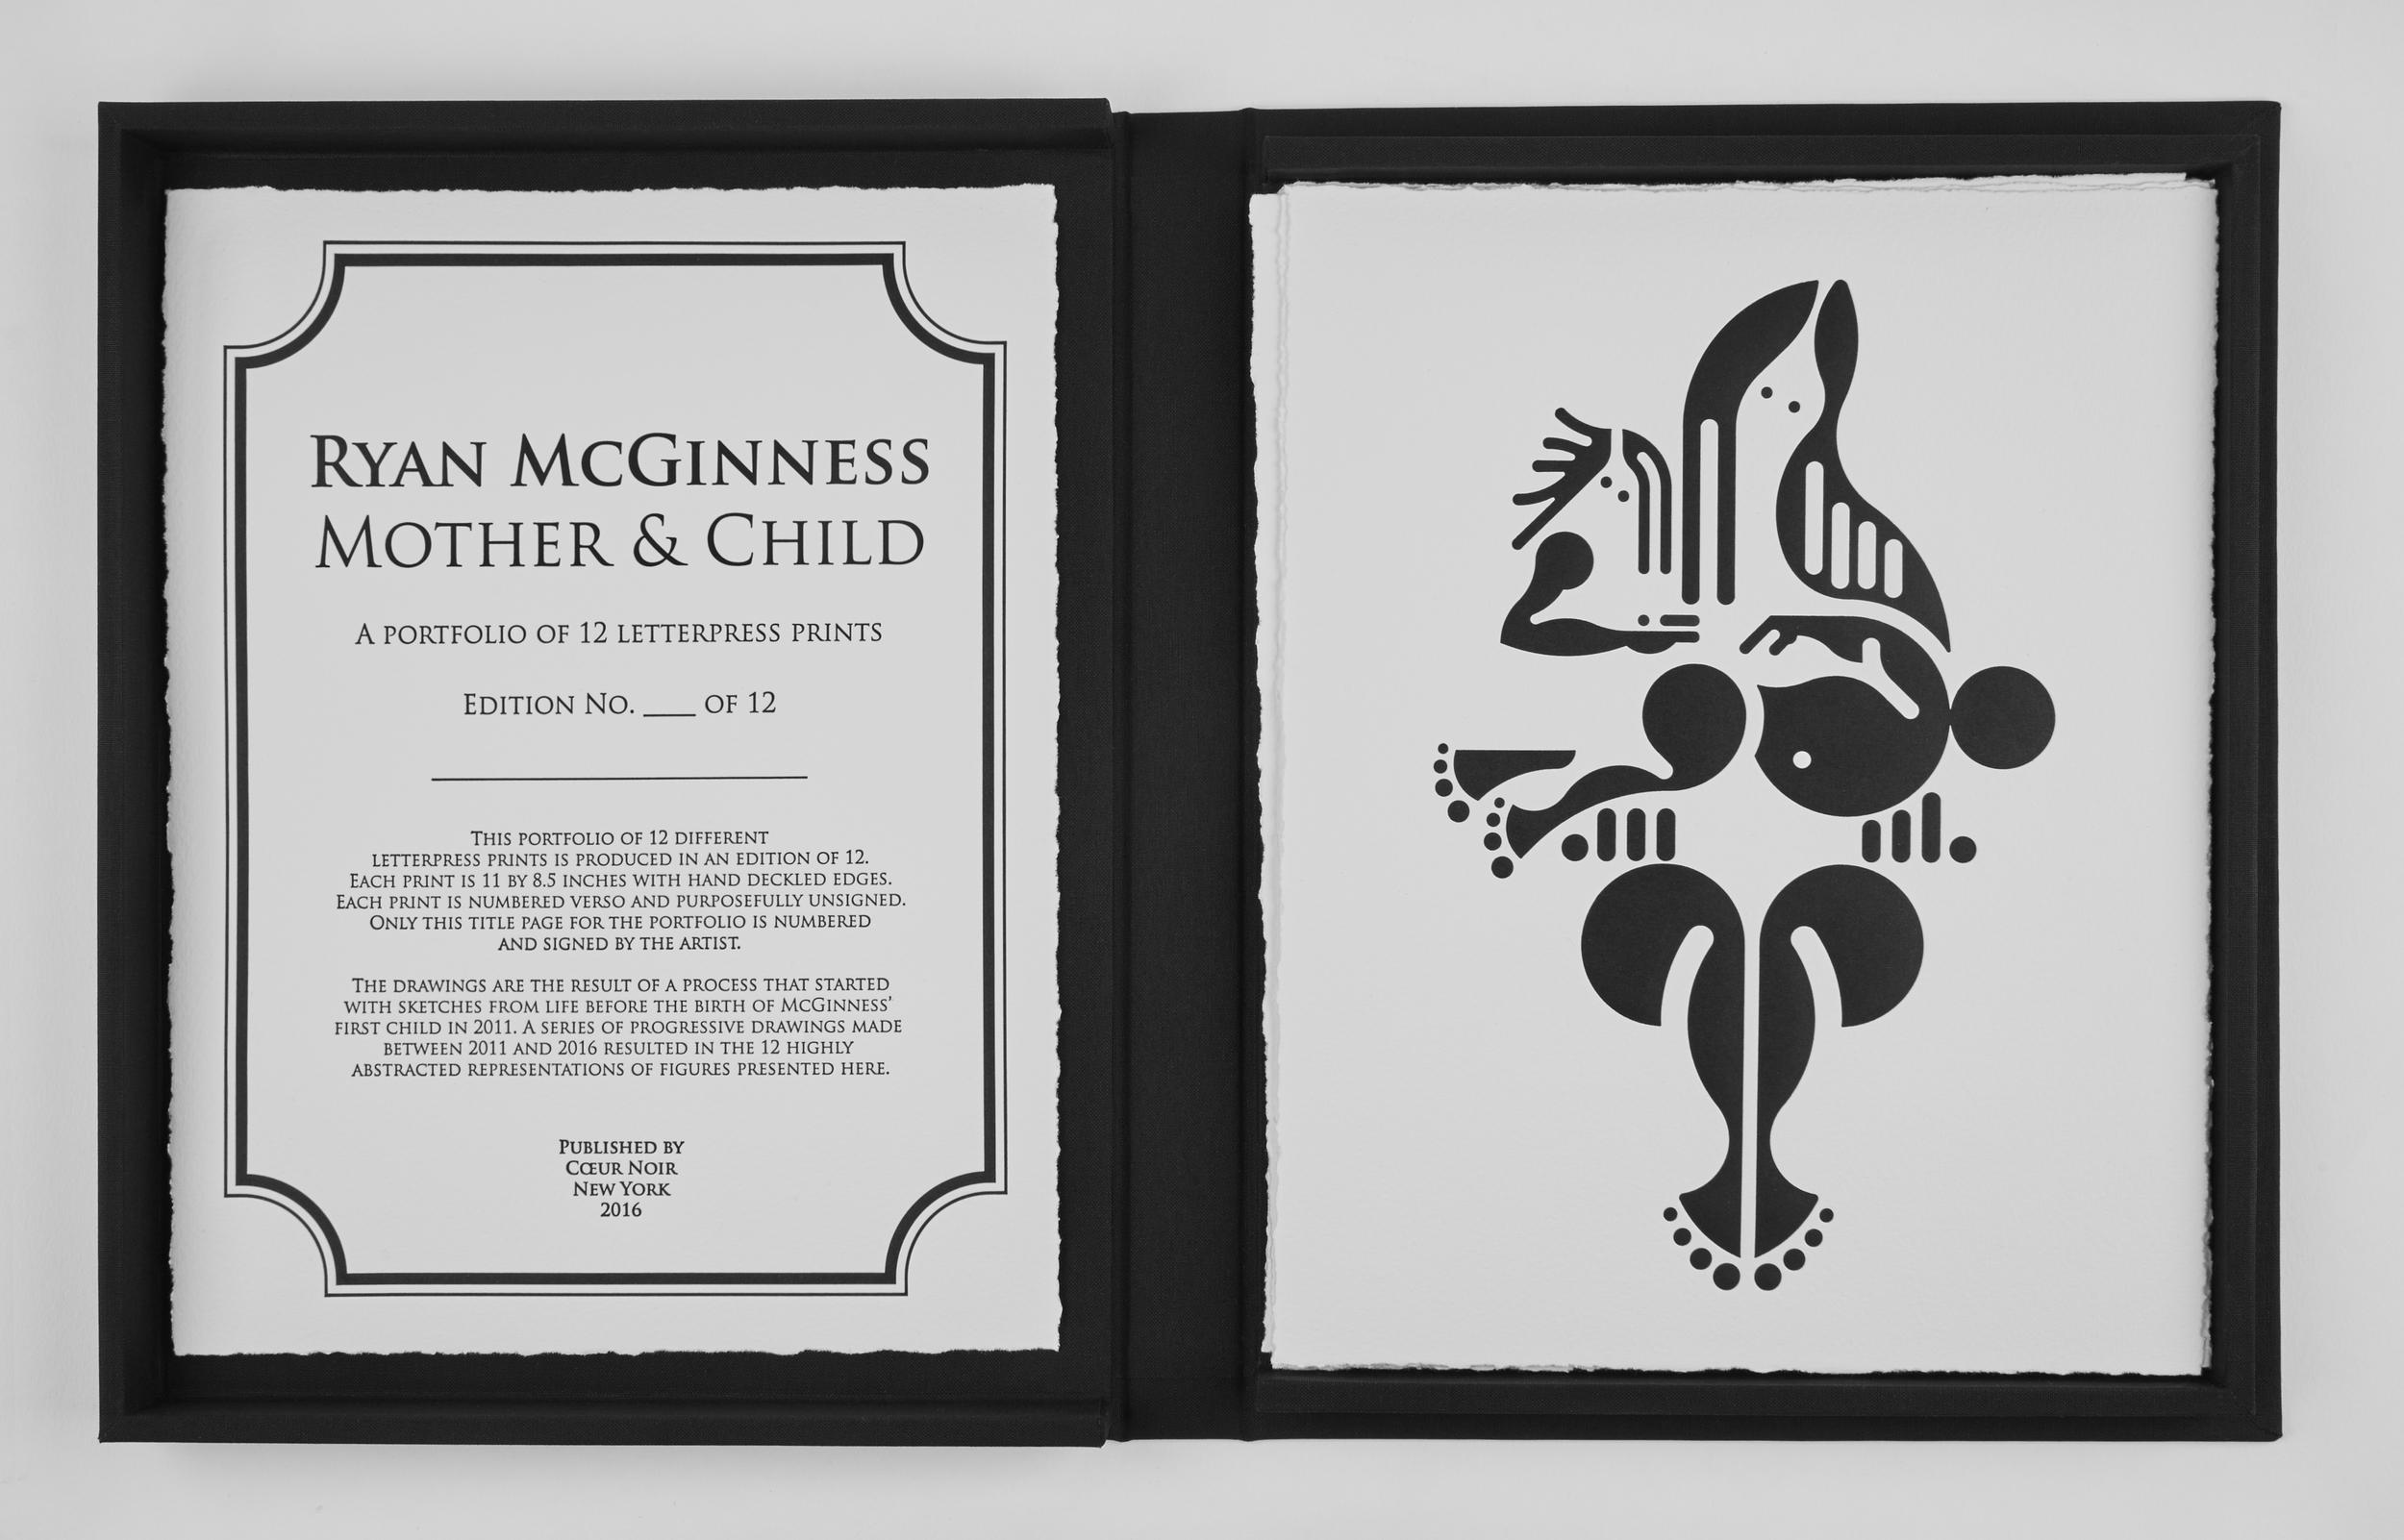 RYAN McGINNESS - Mother & Child